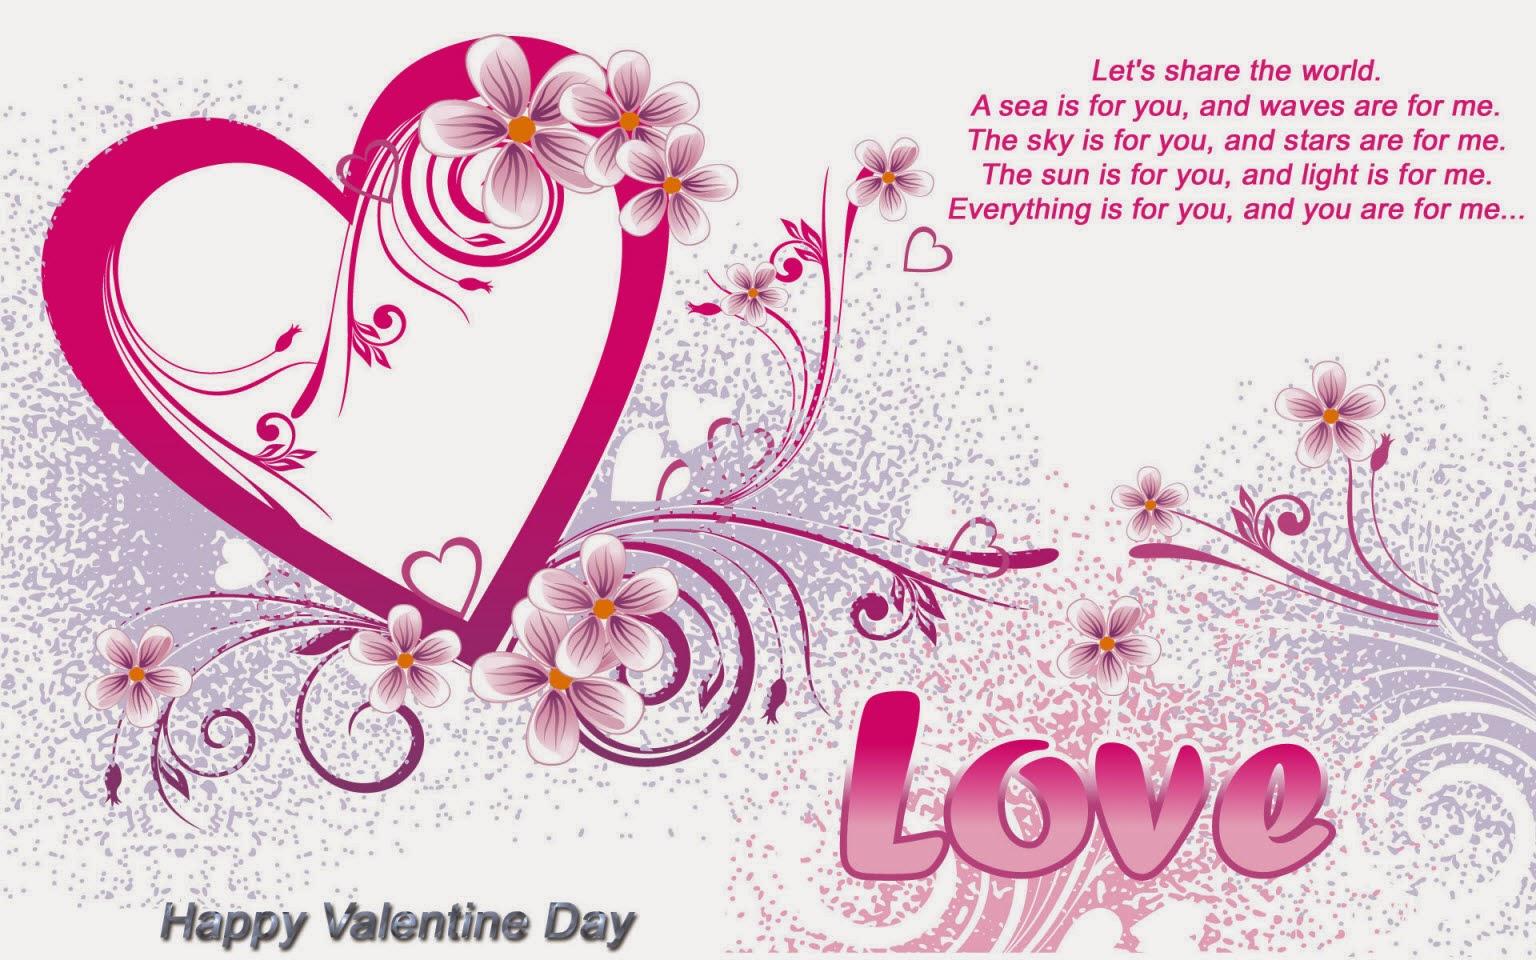 valentines love poems - Valentines Love Poems